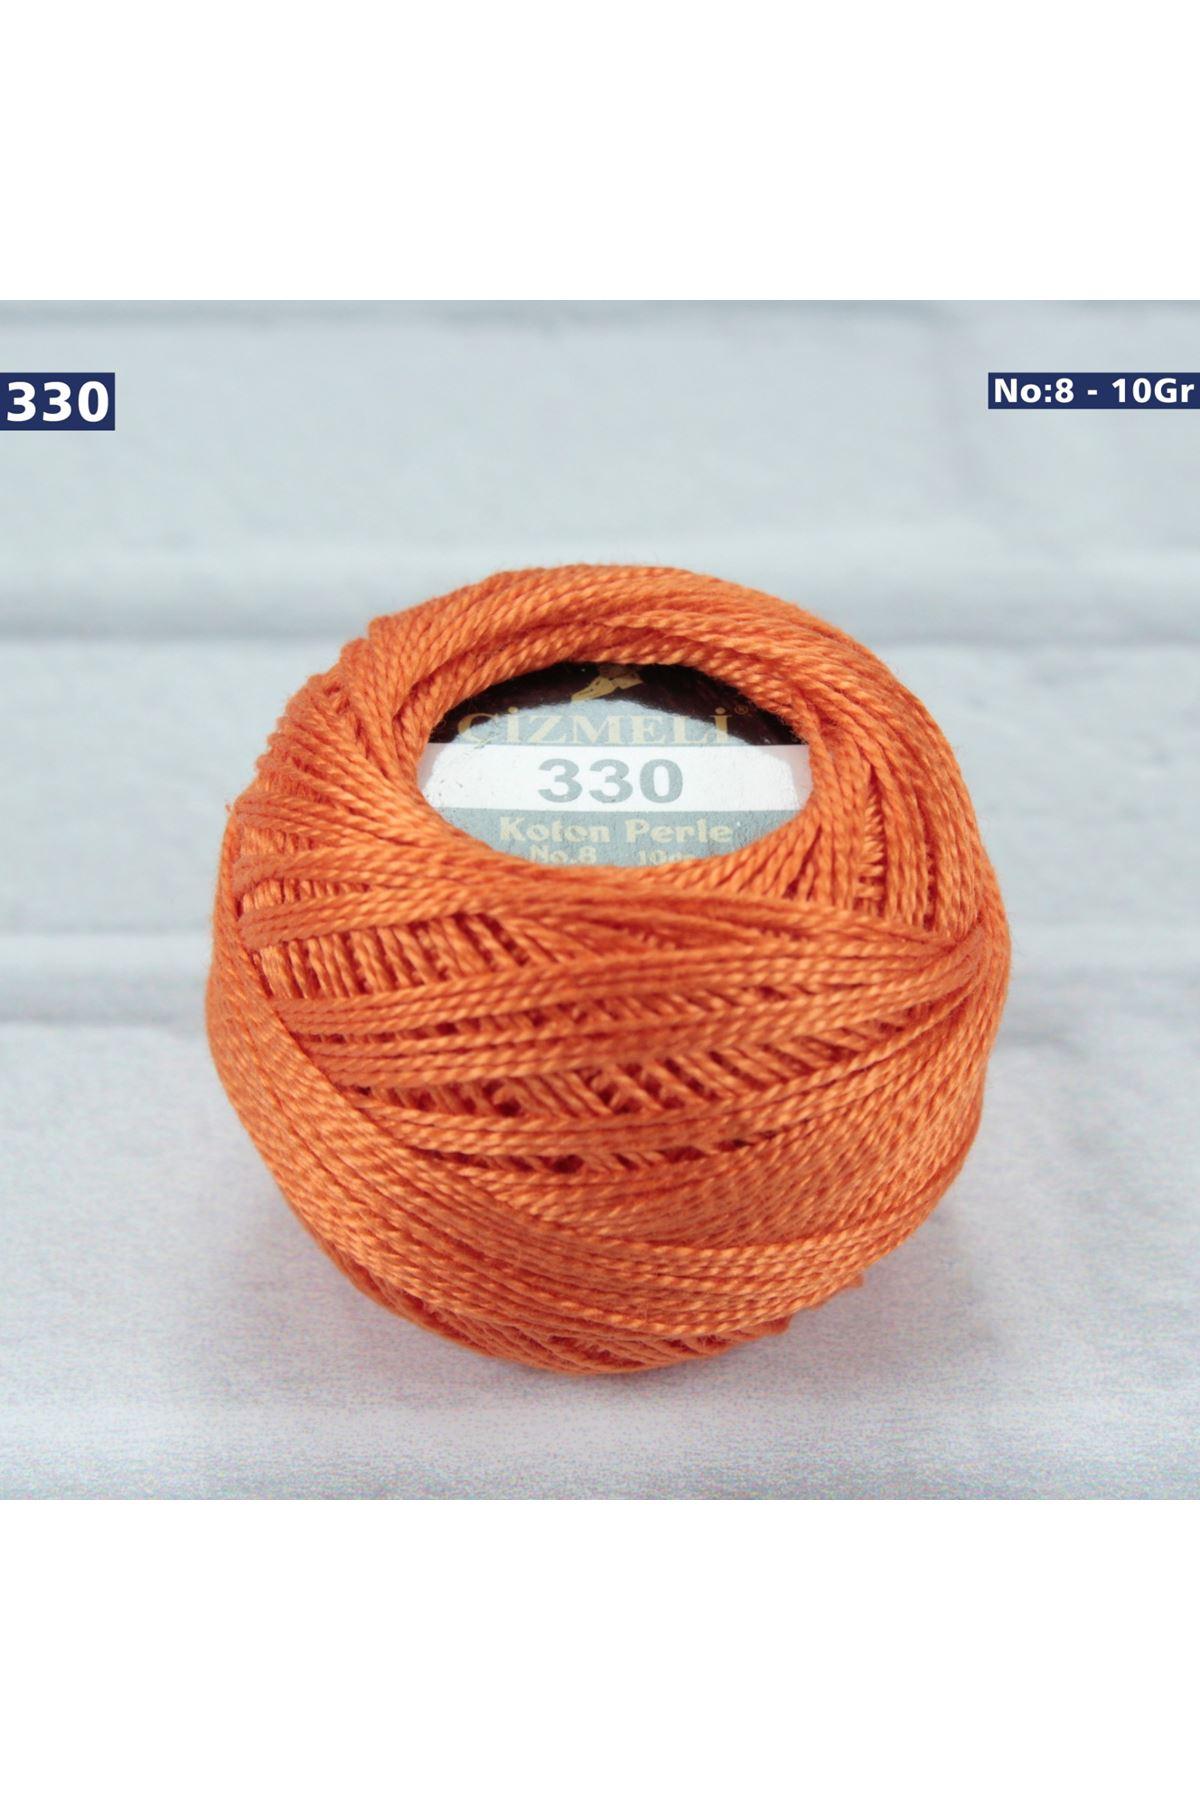 Çizmeli Cotton Perle Nakış İpliği No: 330